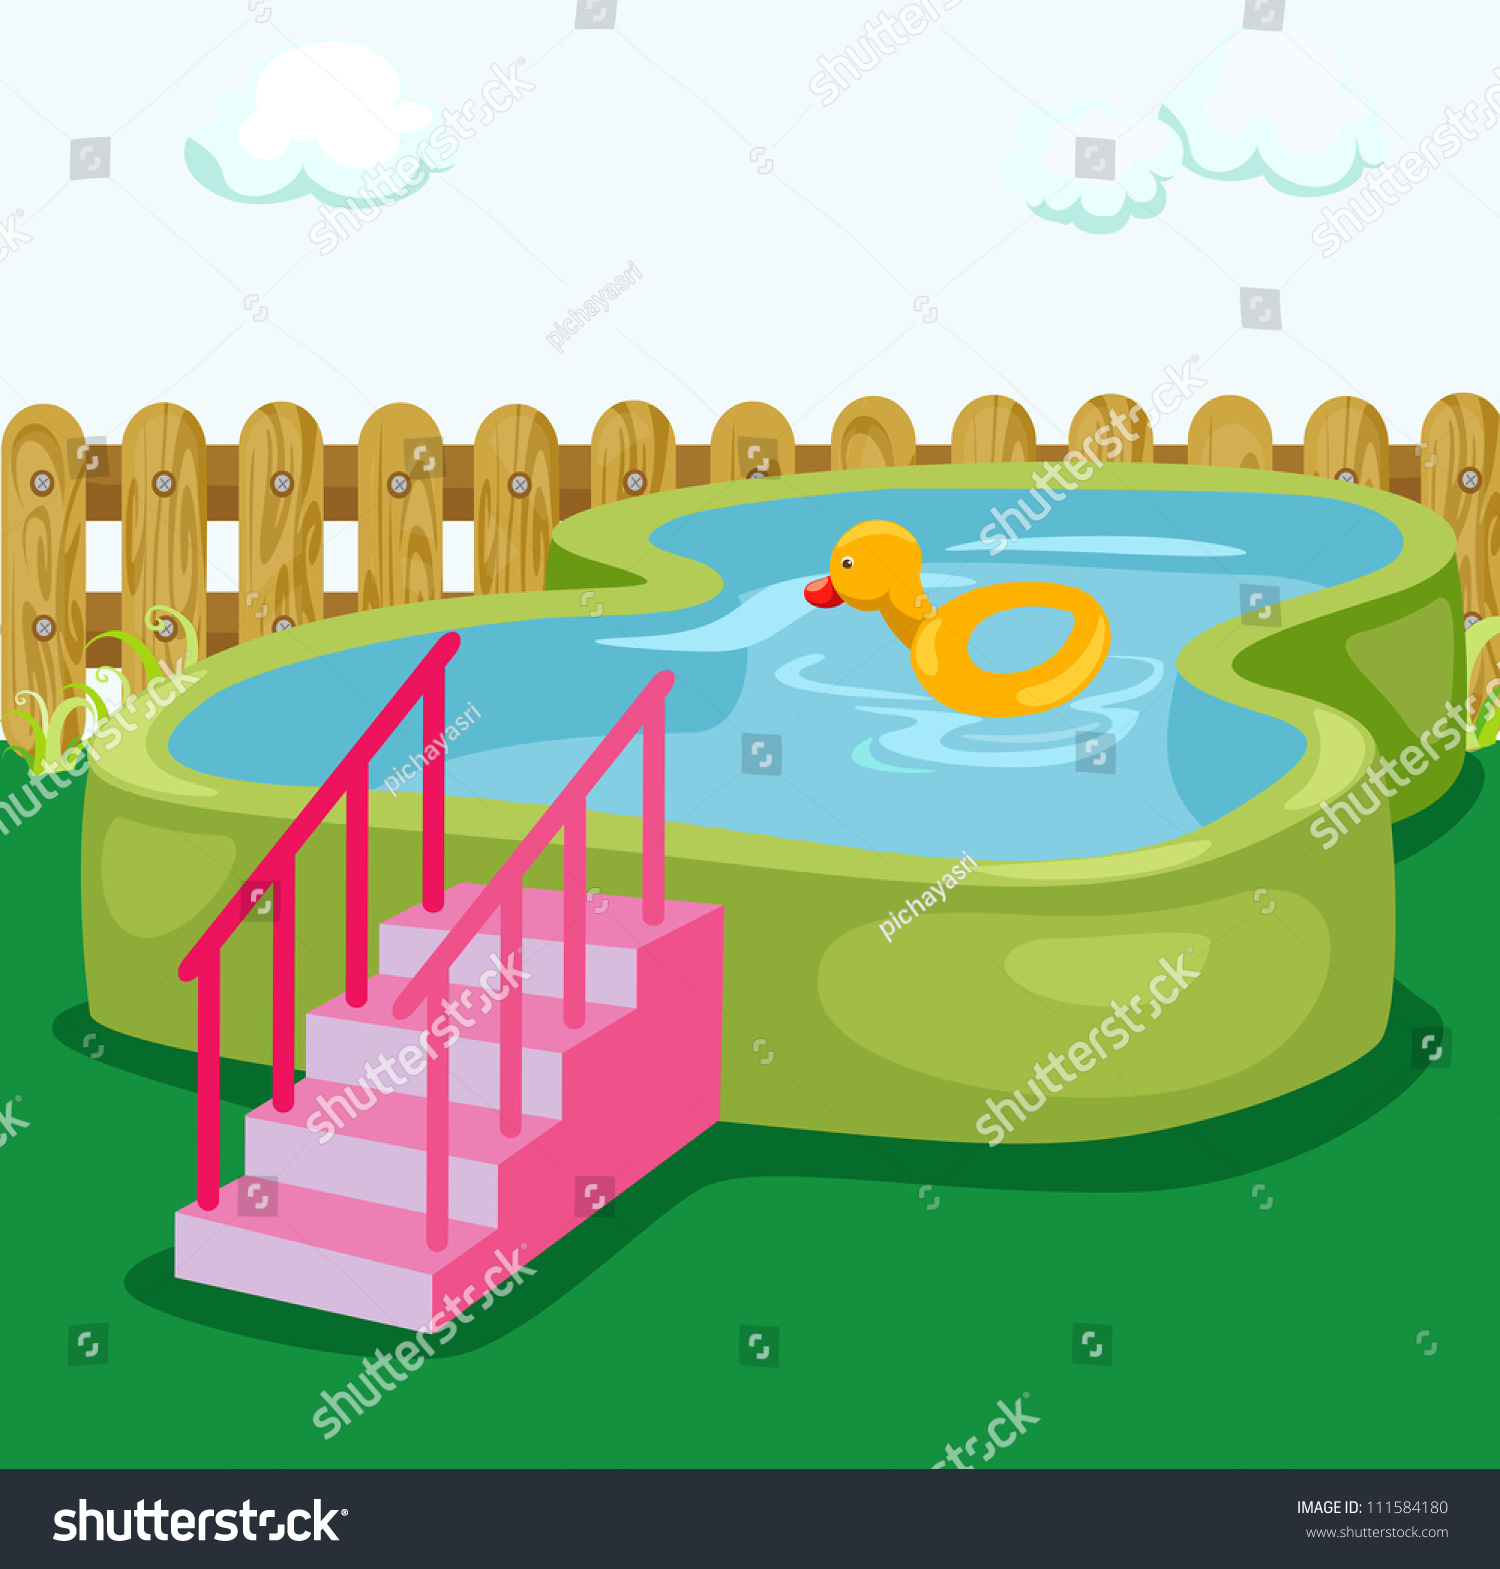 Illustration kid swimming pool garden stock